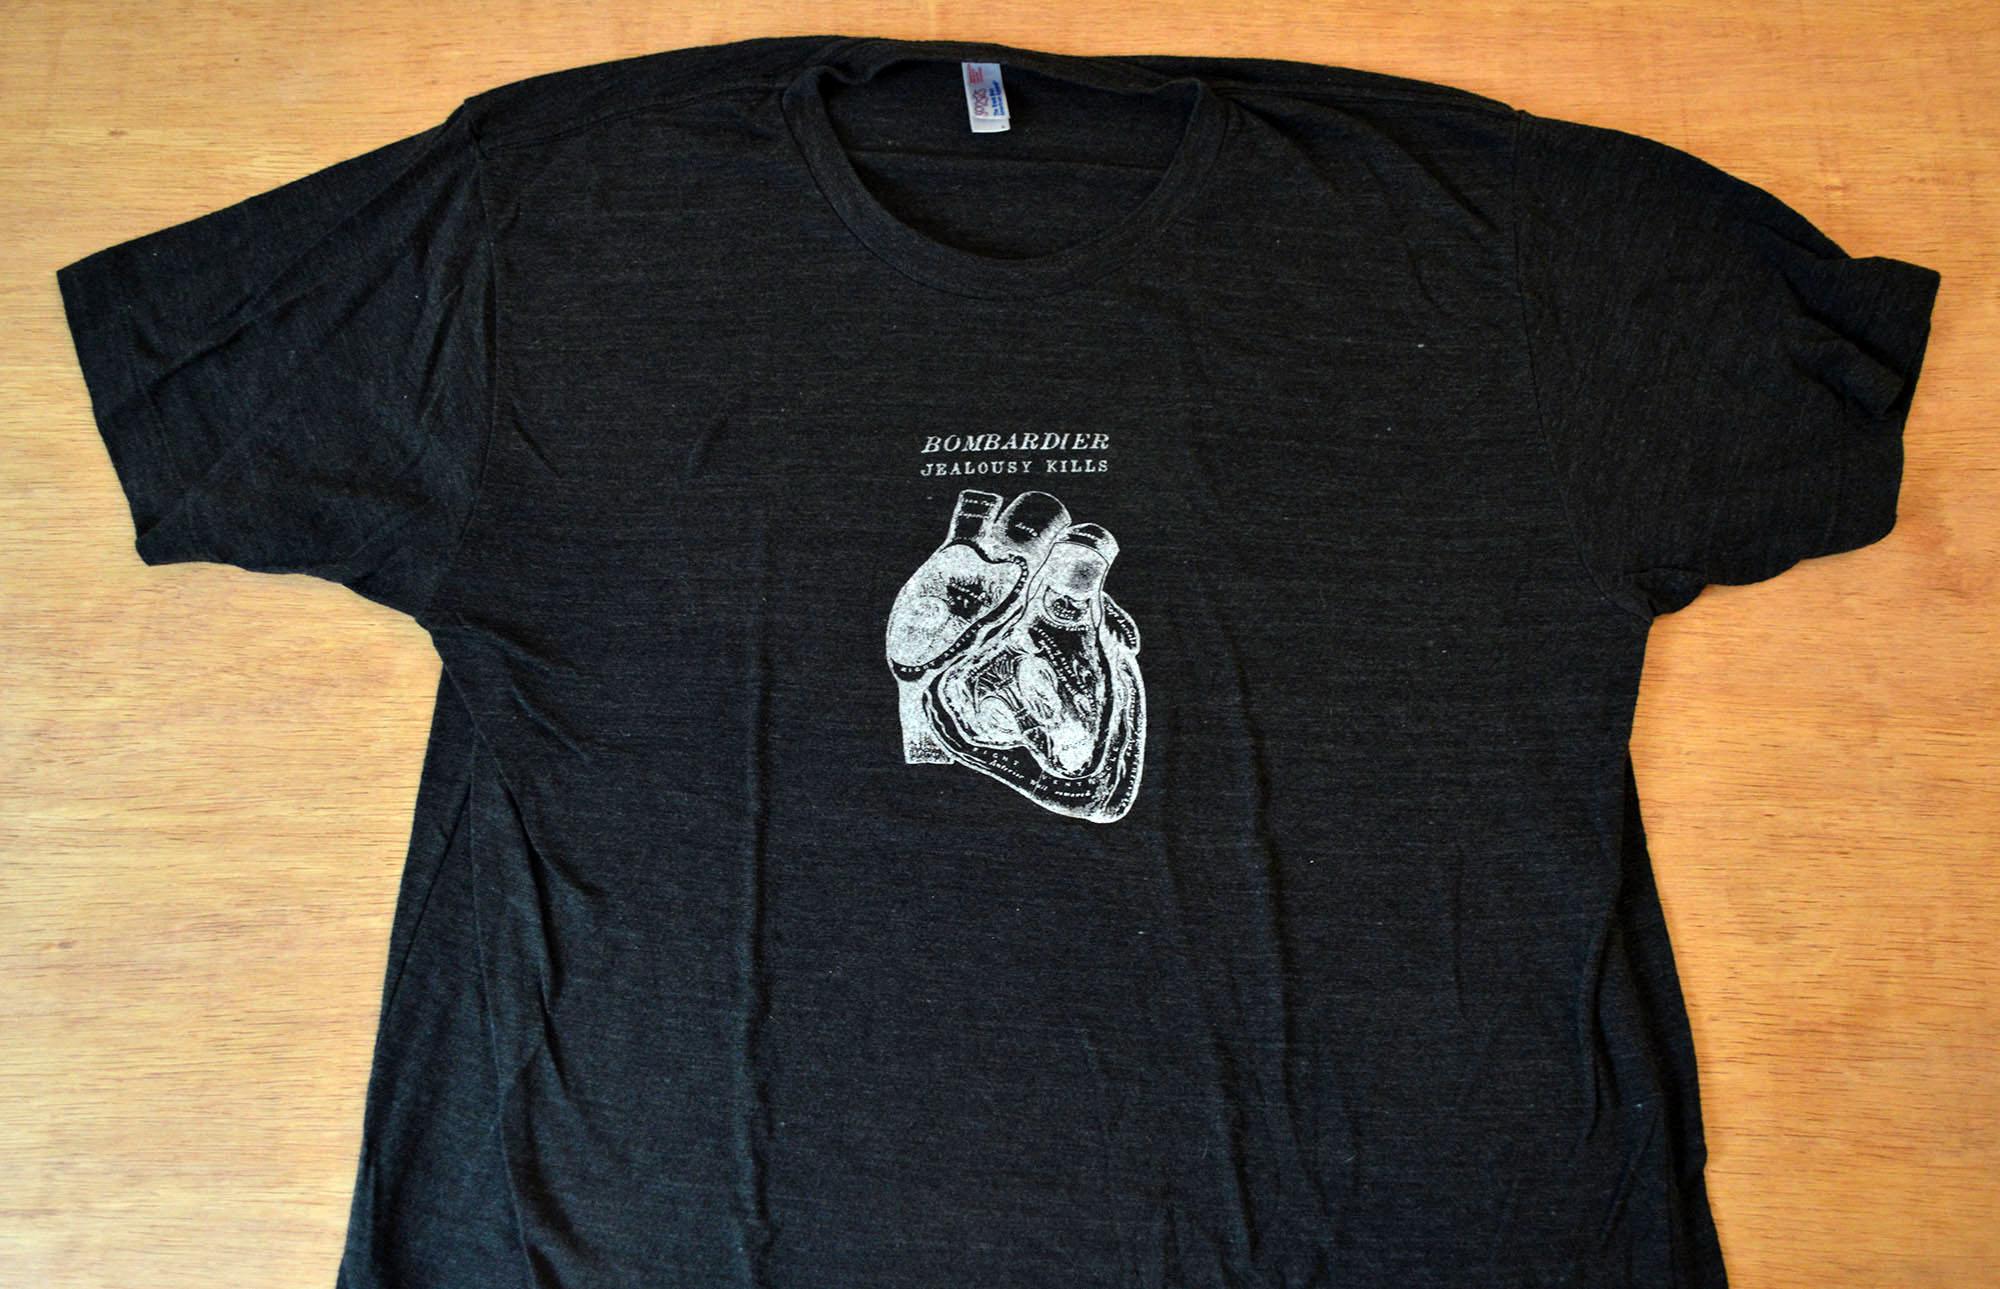 American apparel t shirt printing